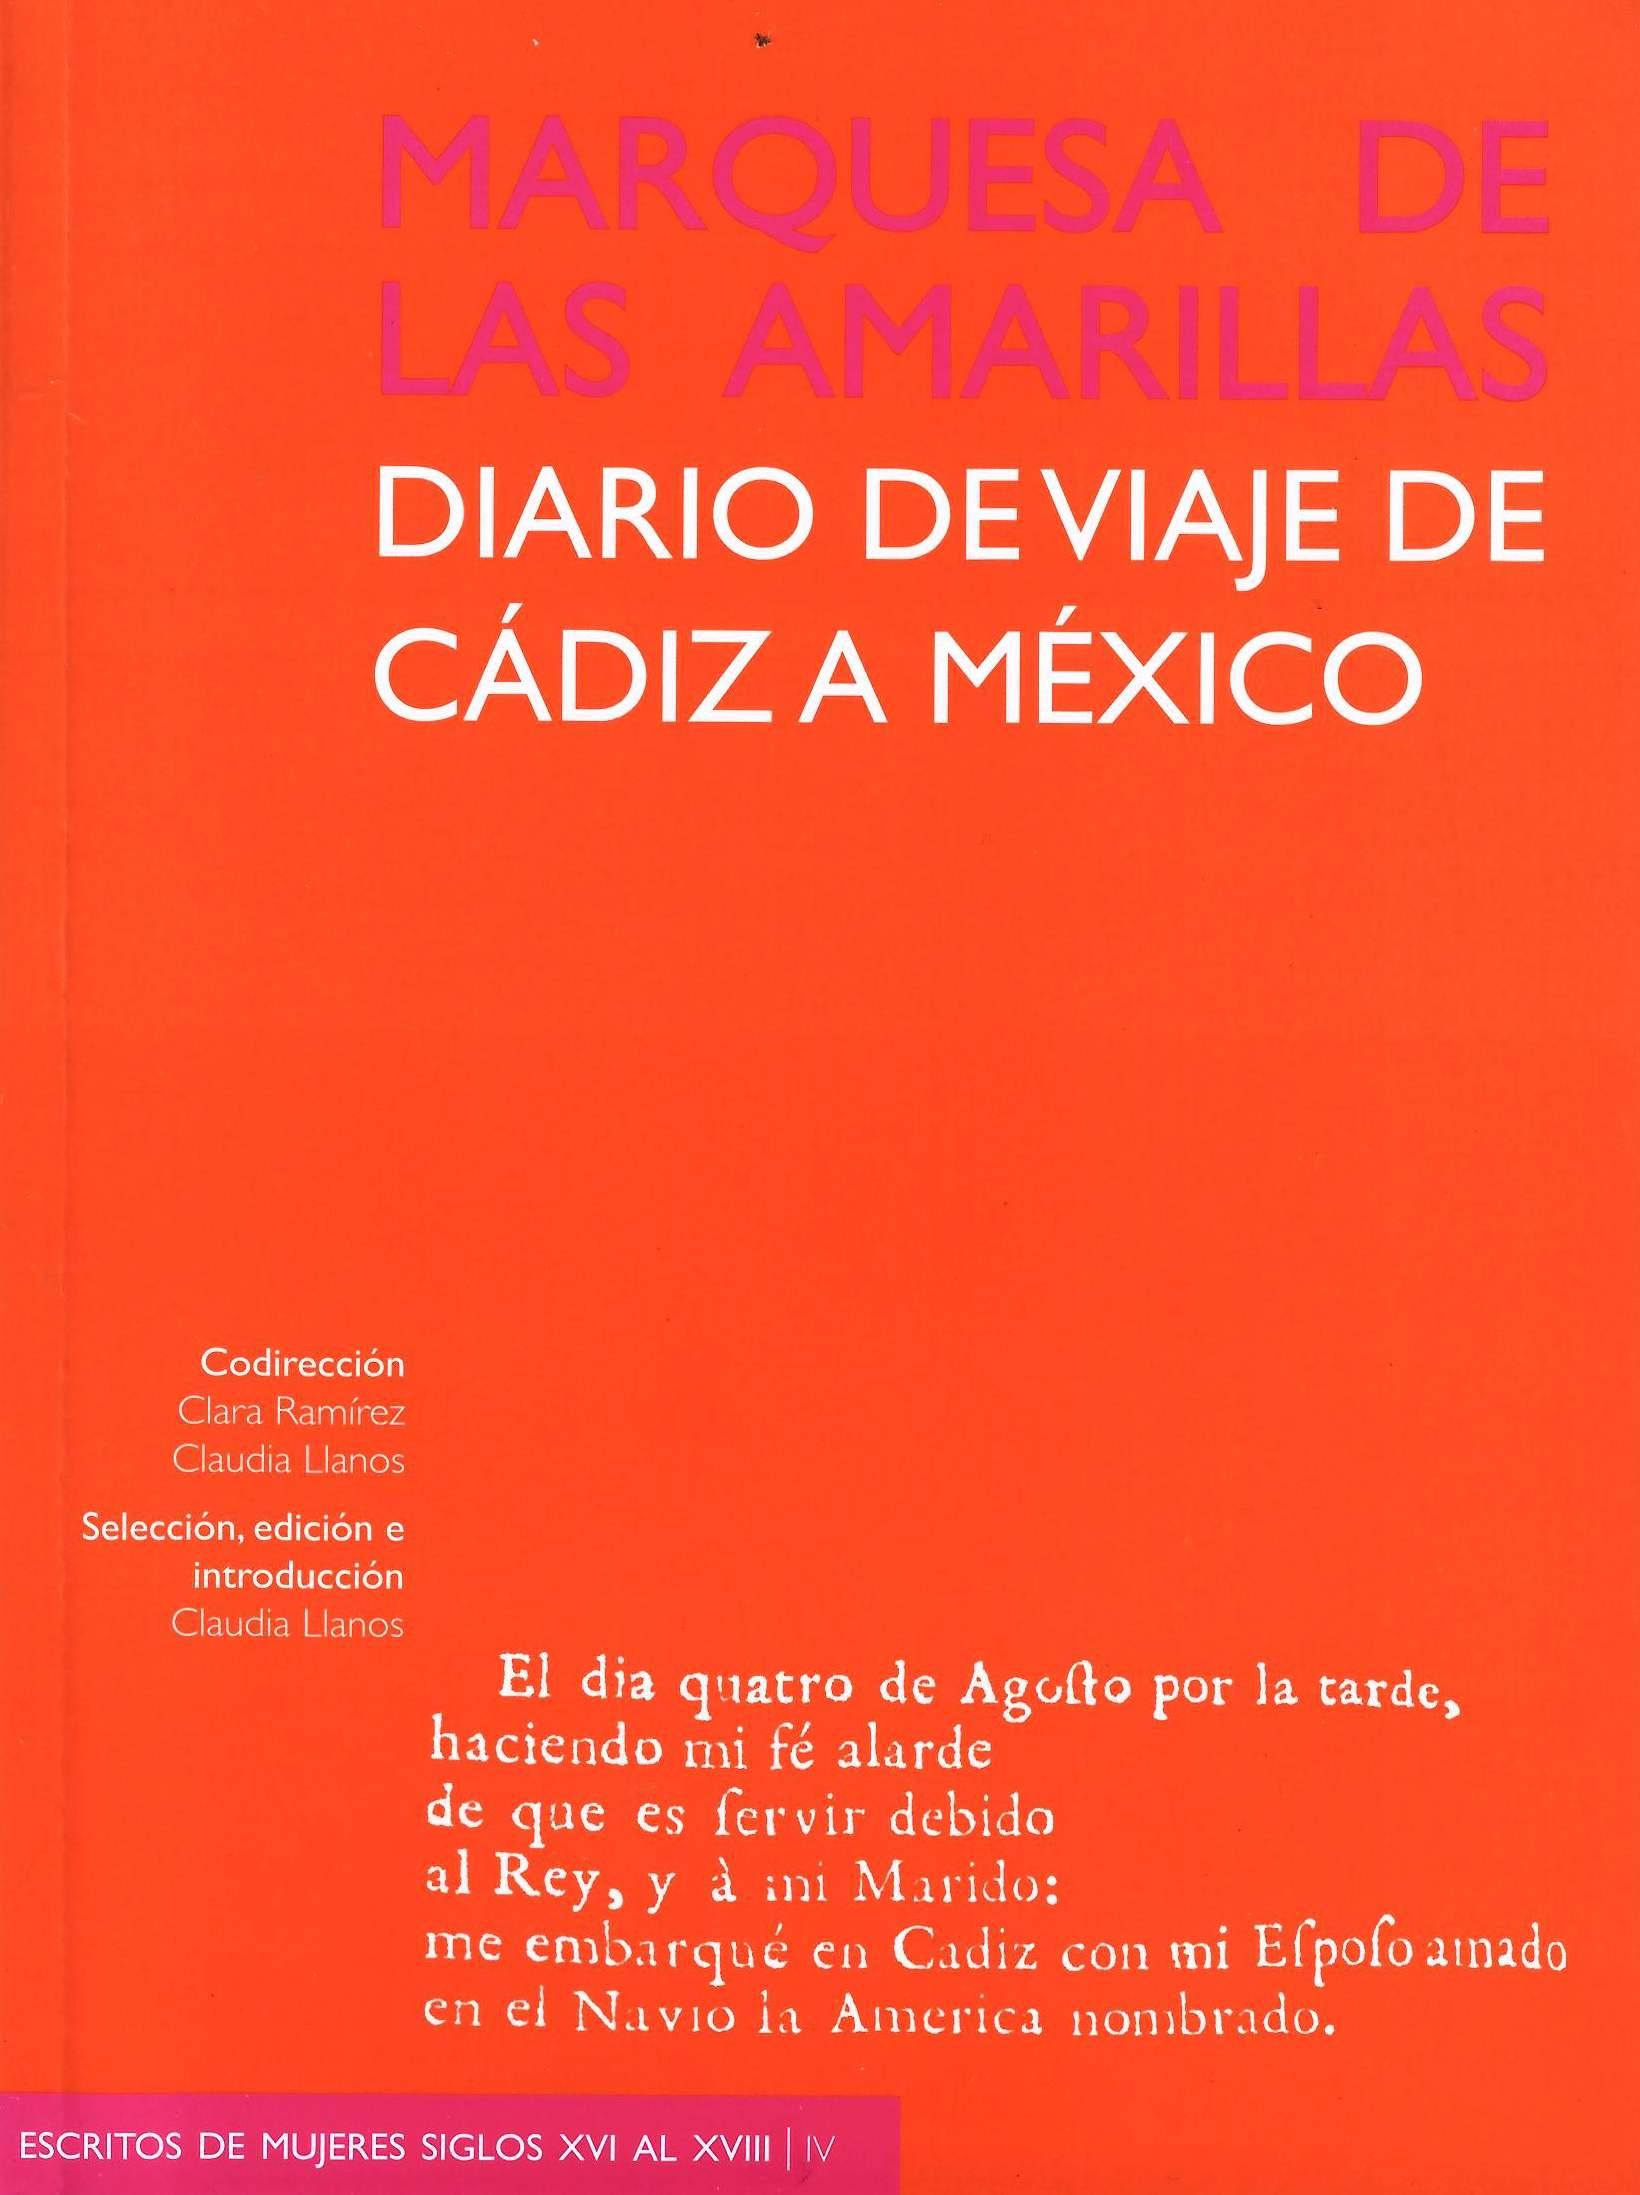 Marquesa de las Amarillas: diario de viaje de Cádiz a México